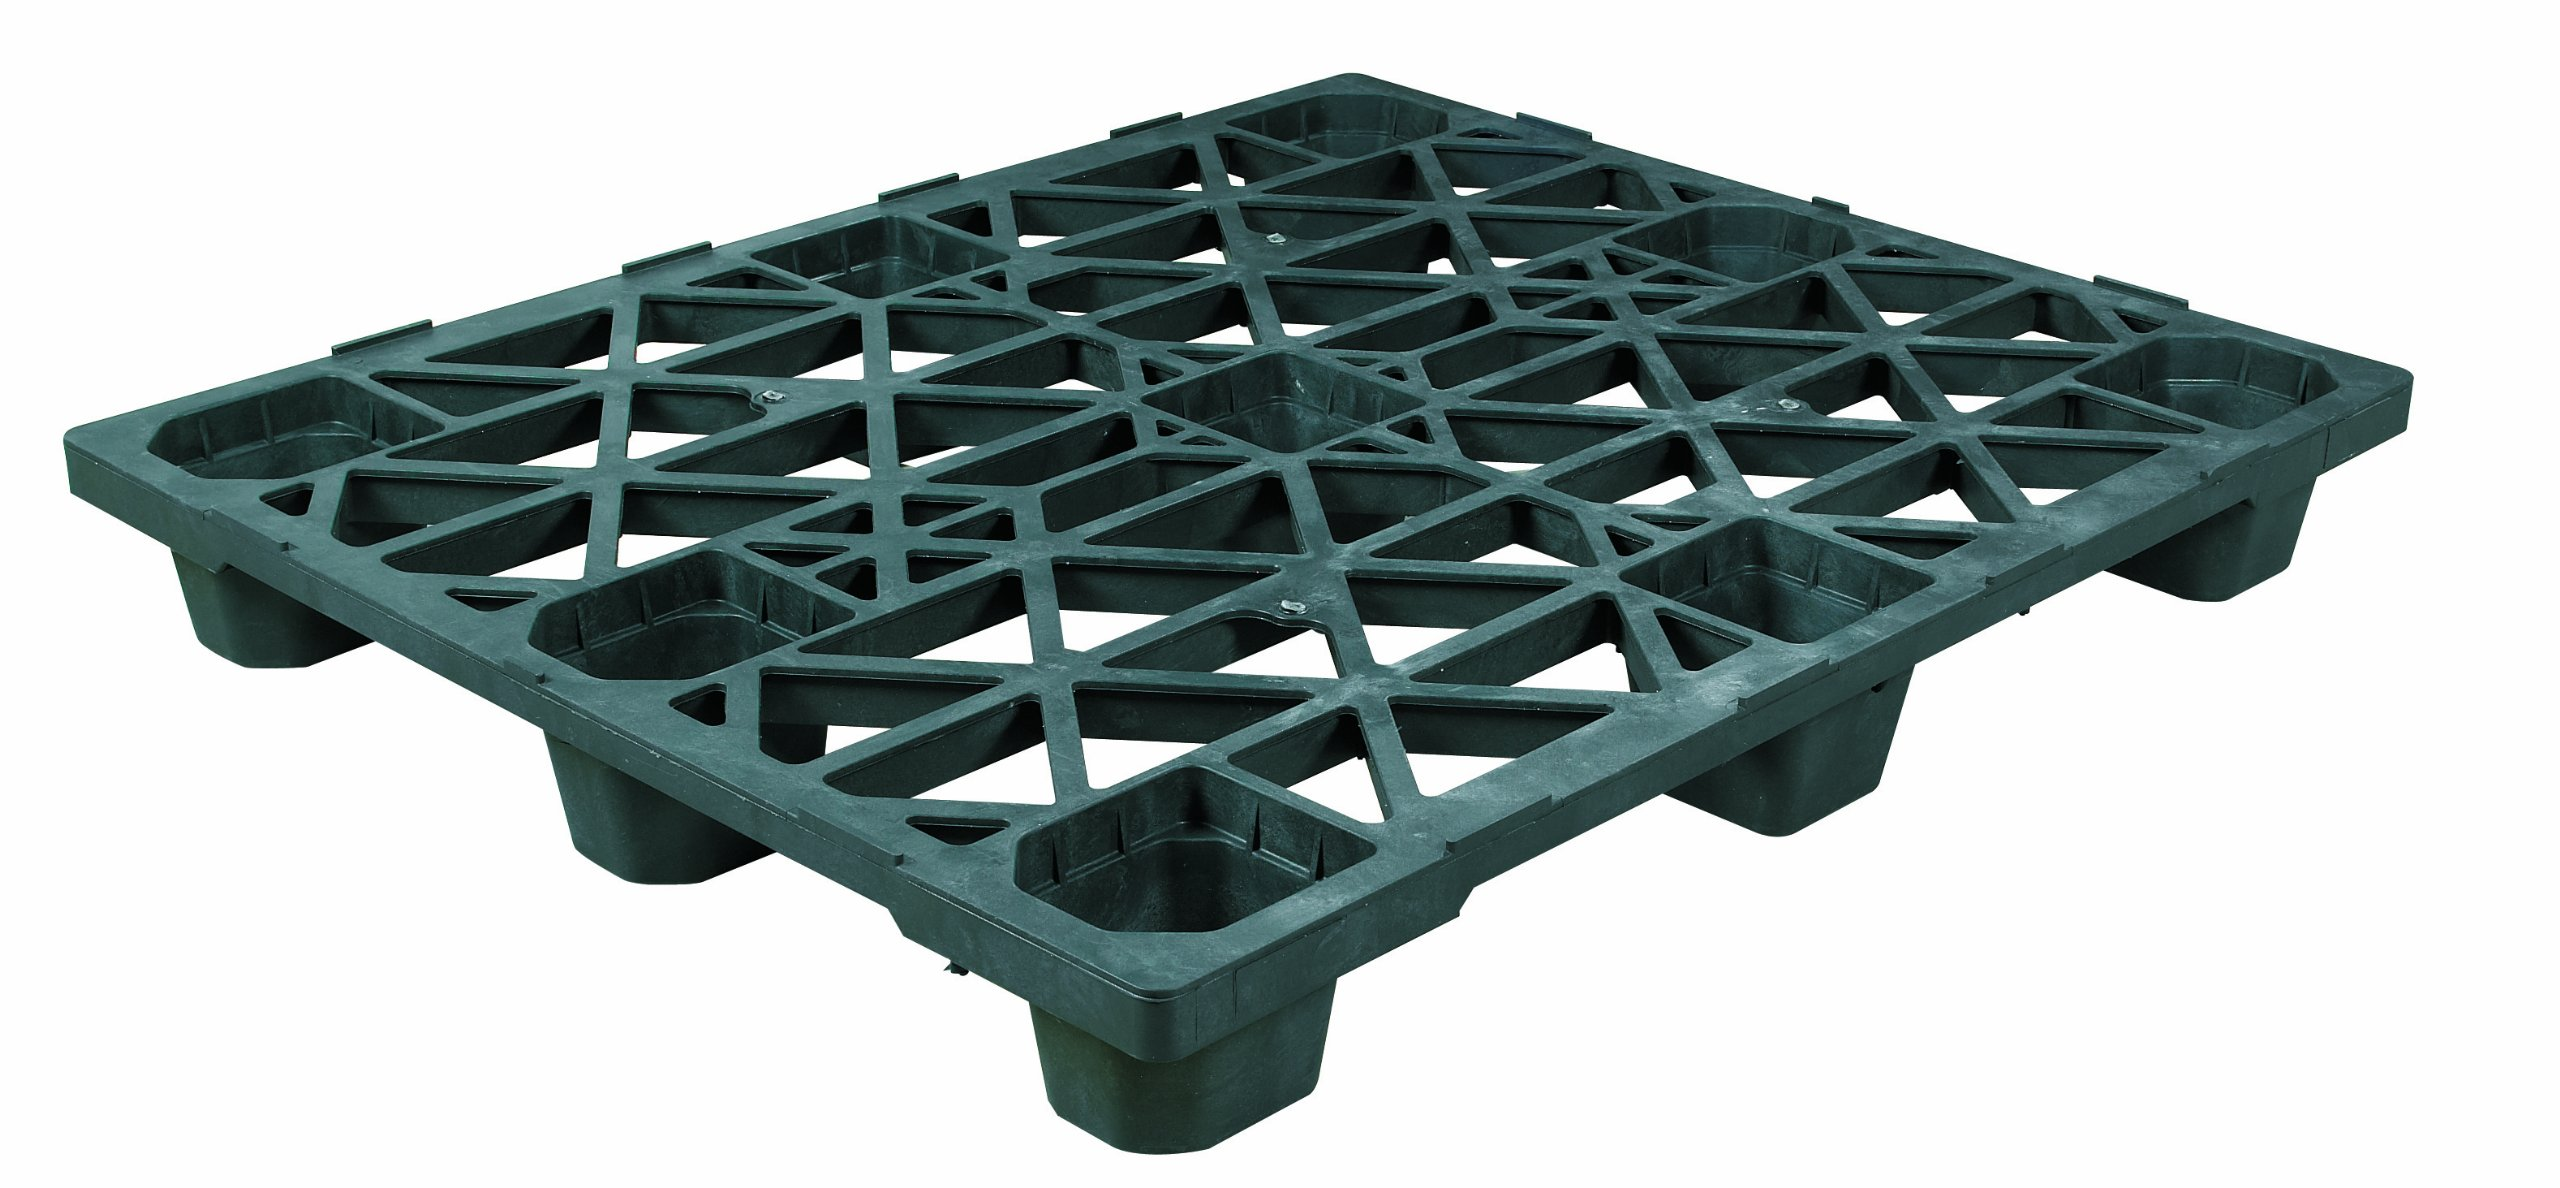 Aviditi CPP330 Industrial Plastic Pallet, 48'' x 40'' x 5 1/2'', Black